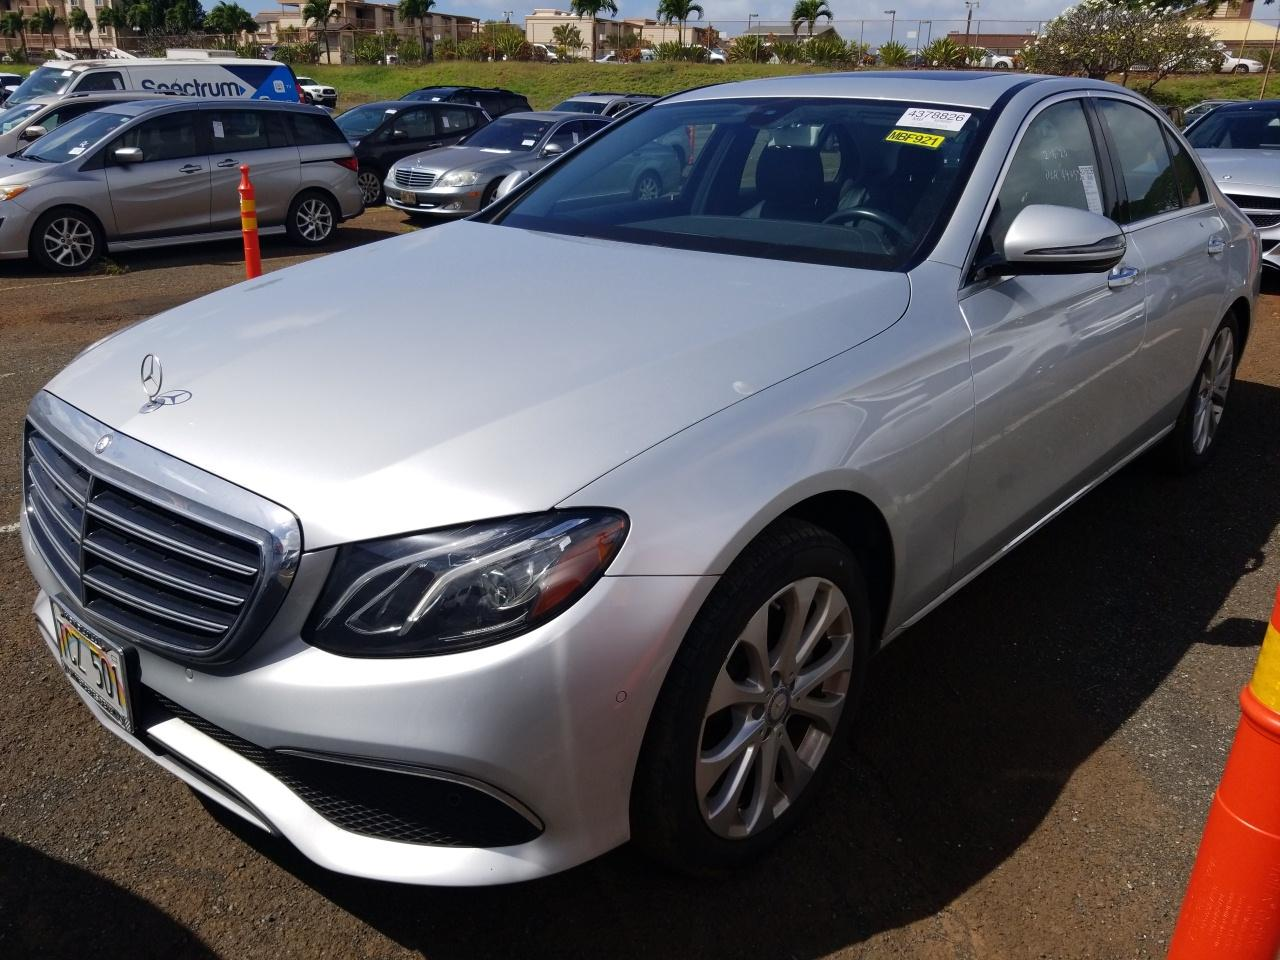 2017 Mercedes-benz E-class 2.0. Lot 99911006226 Vin WDDZF4JBXHA099578